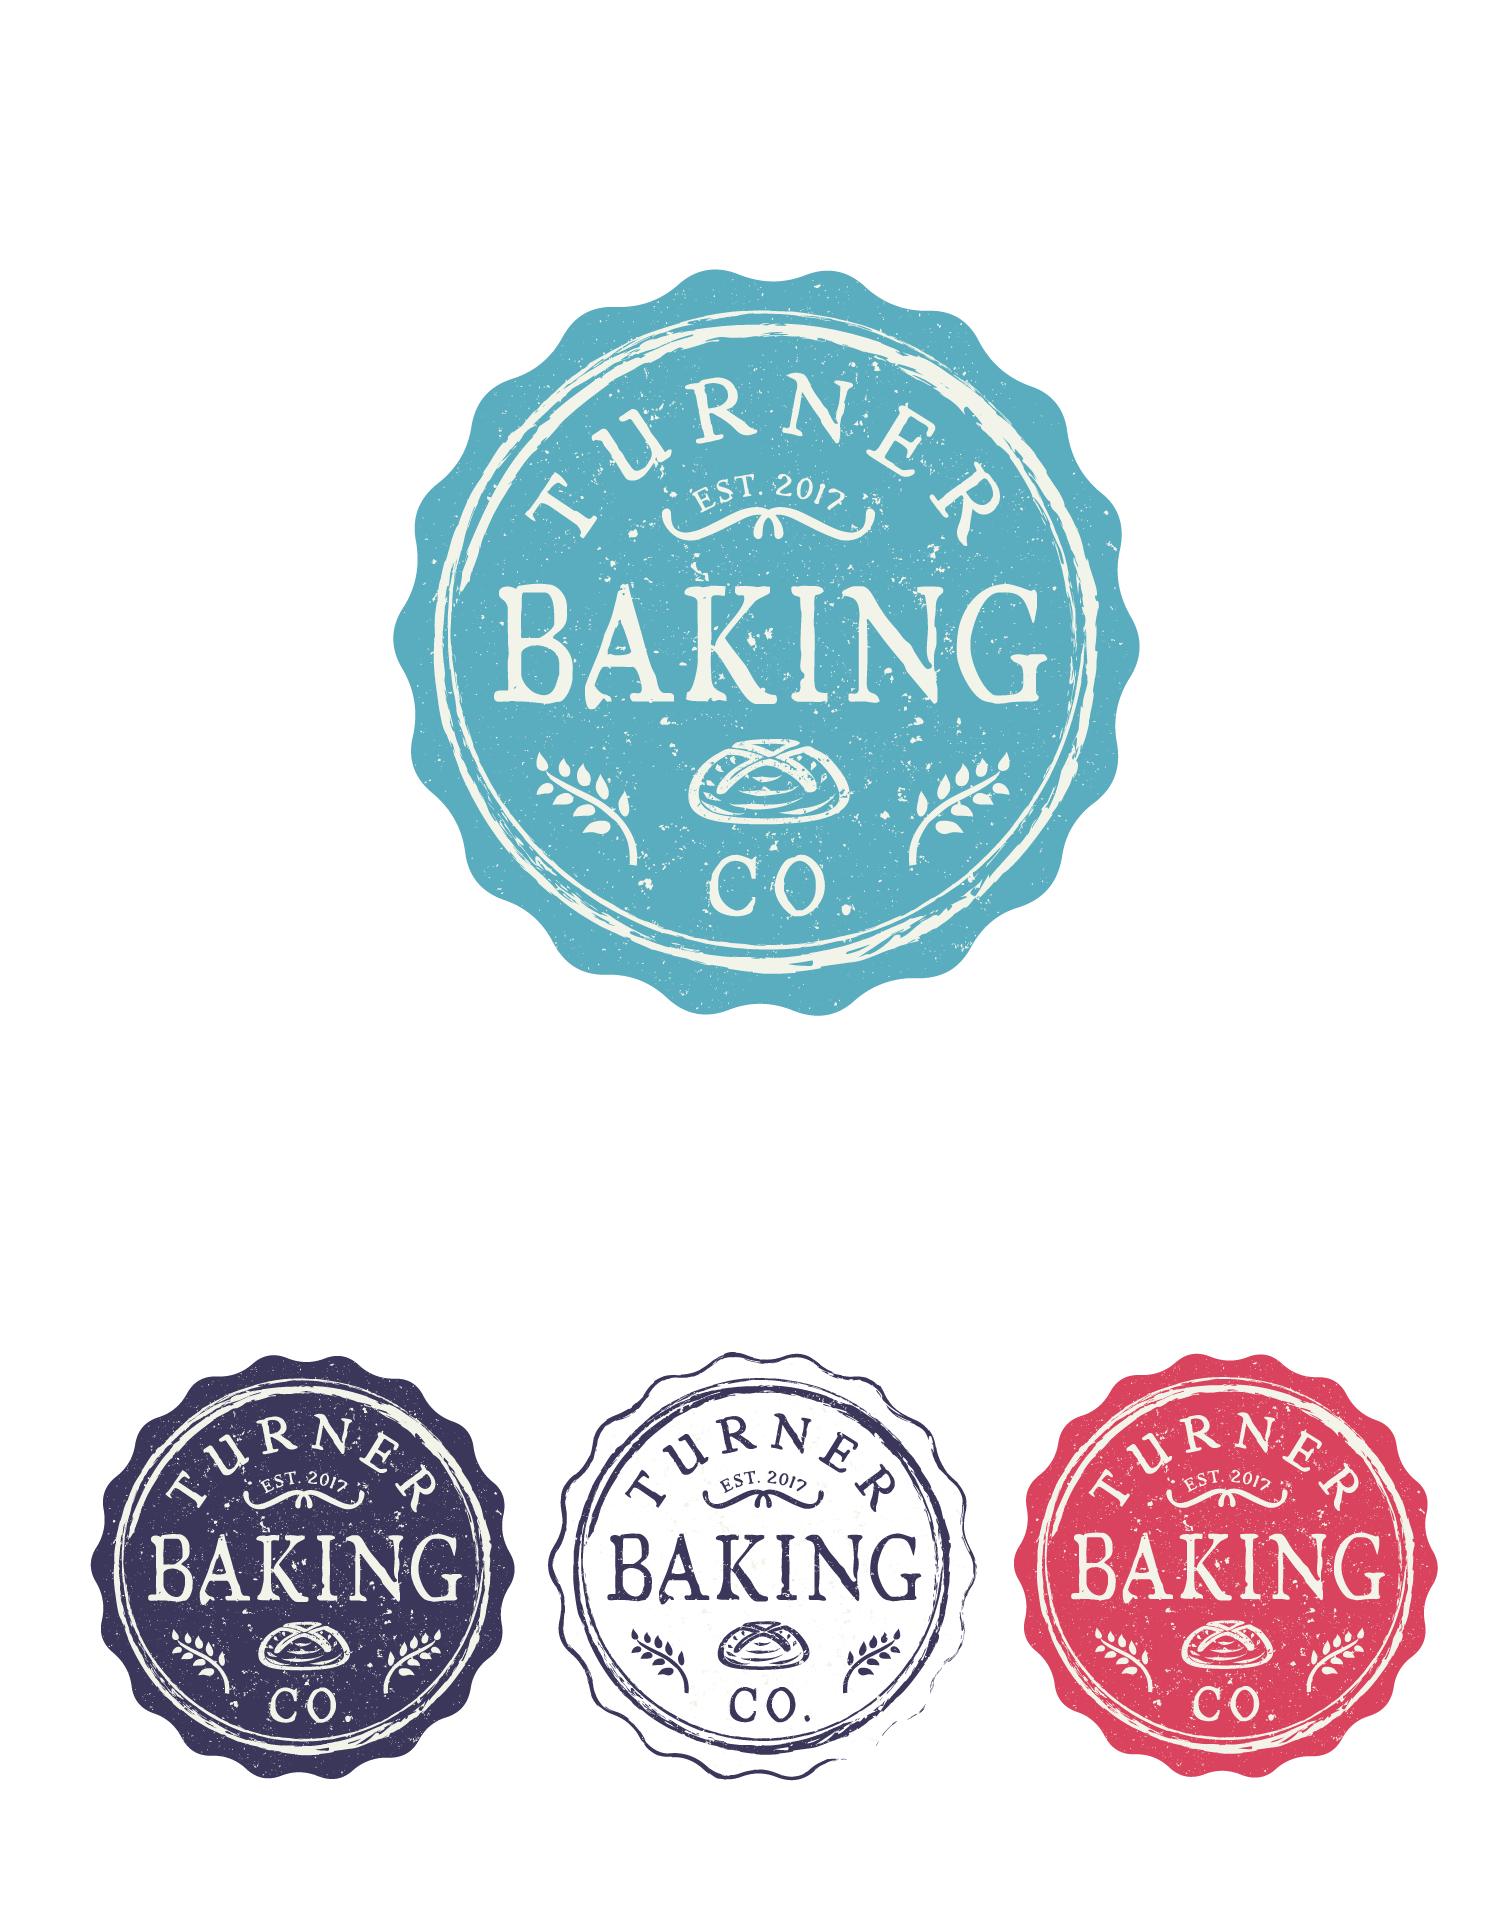 Turner Baking Co. needs vintage logo!